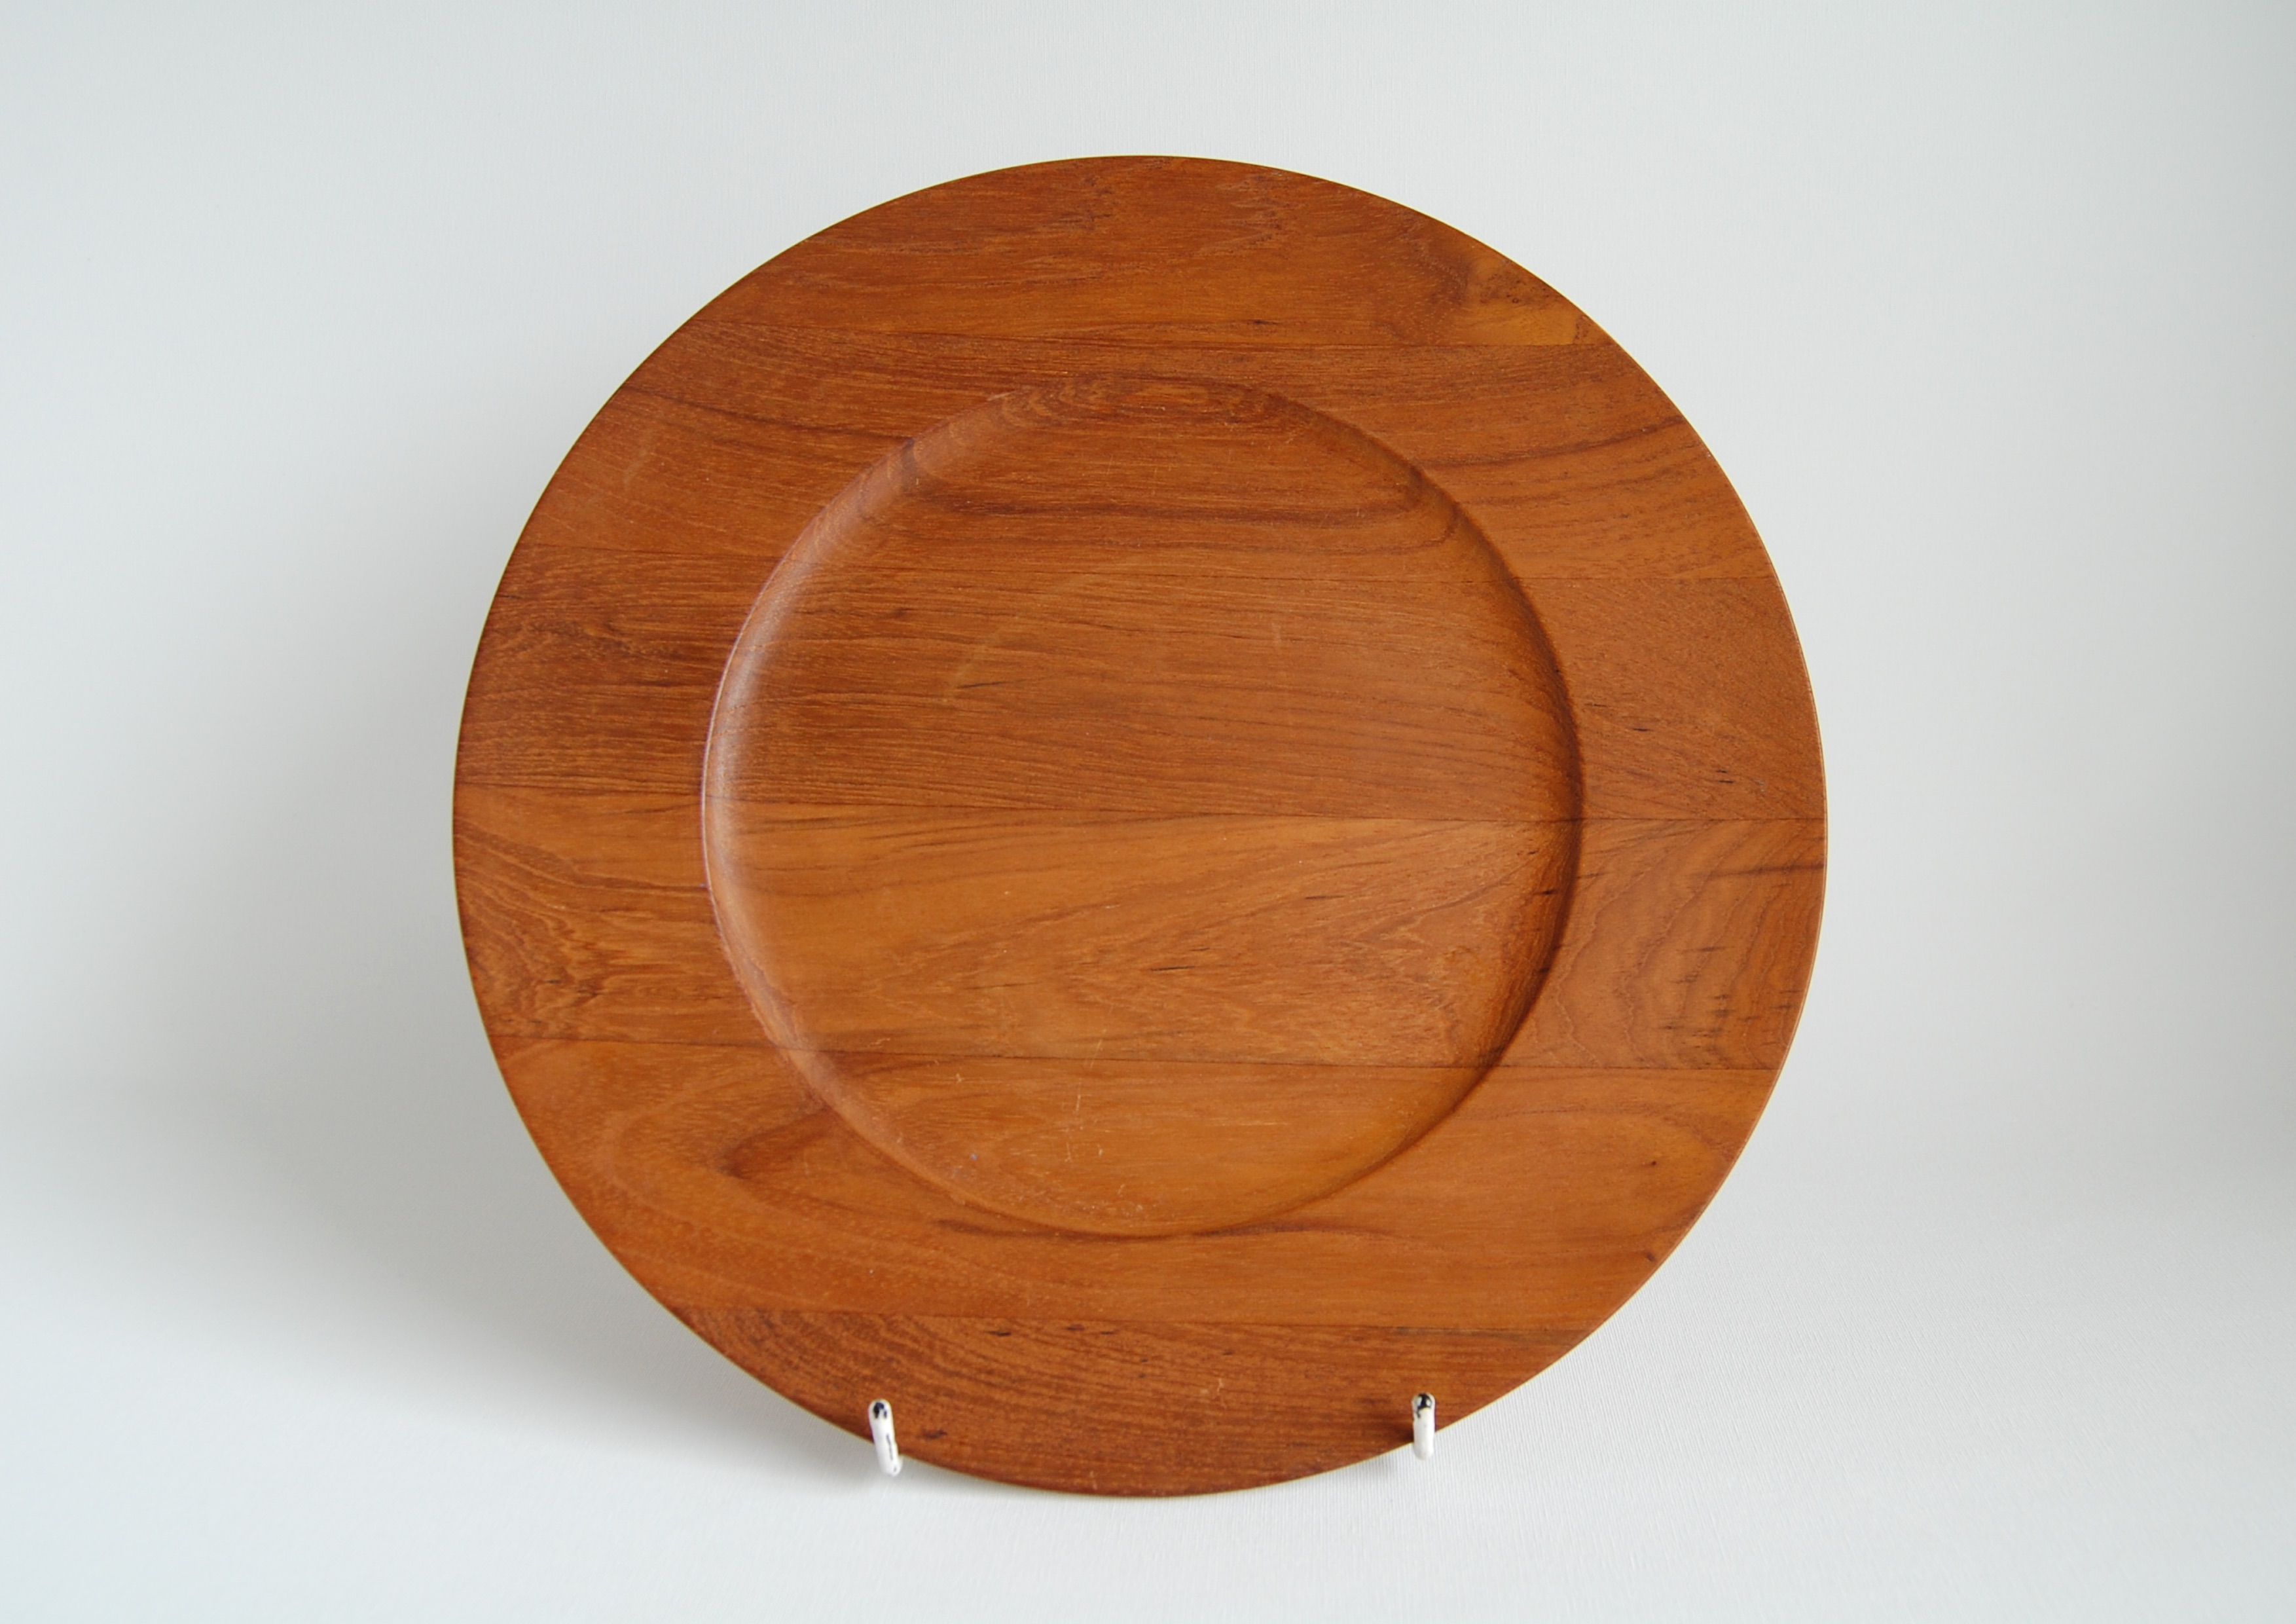 Kronjyden/クロニーデン Jens H. Quistgaard/イェンス H クイストゴー Wooden Plate/ウッドプレート 003